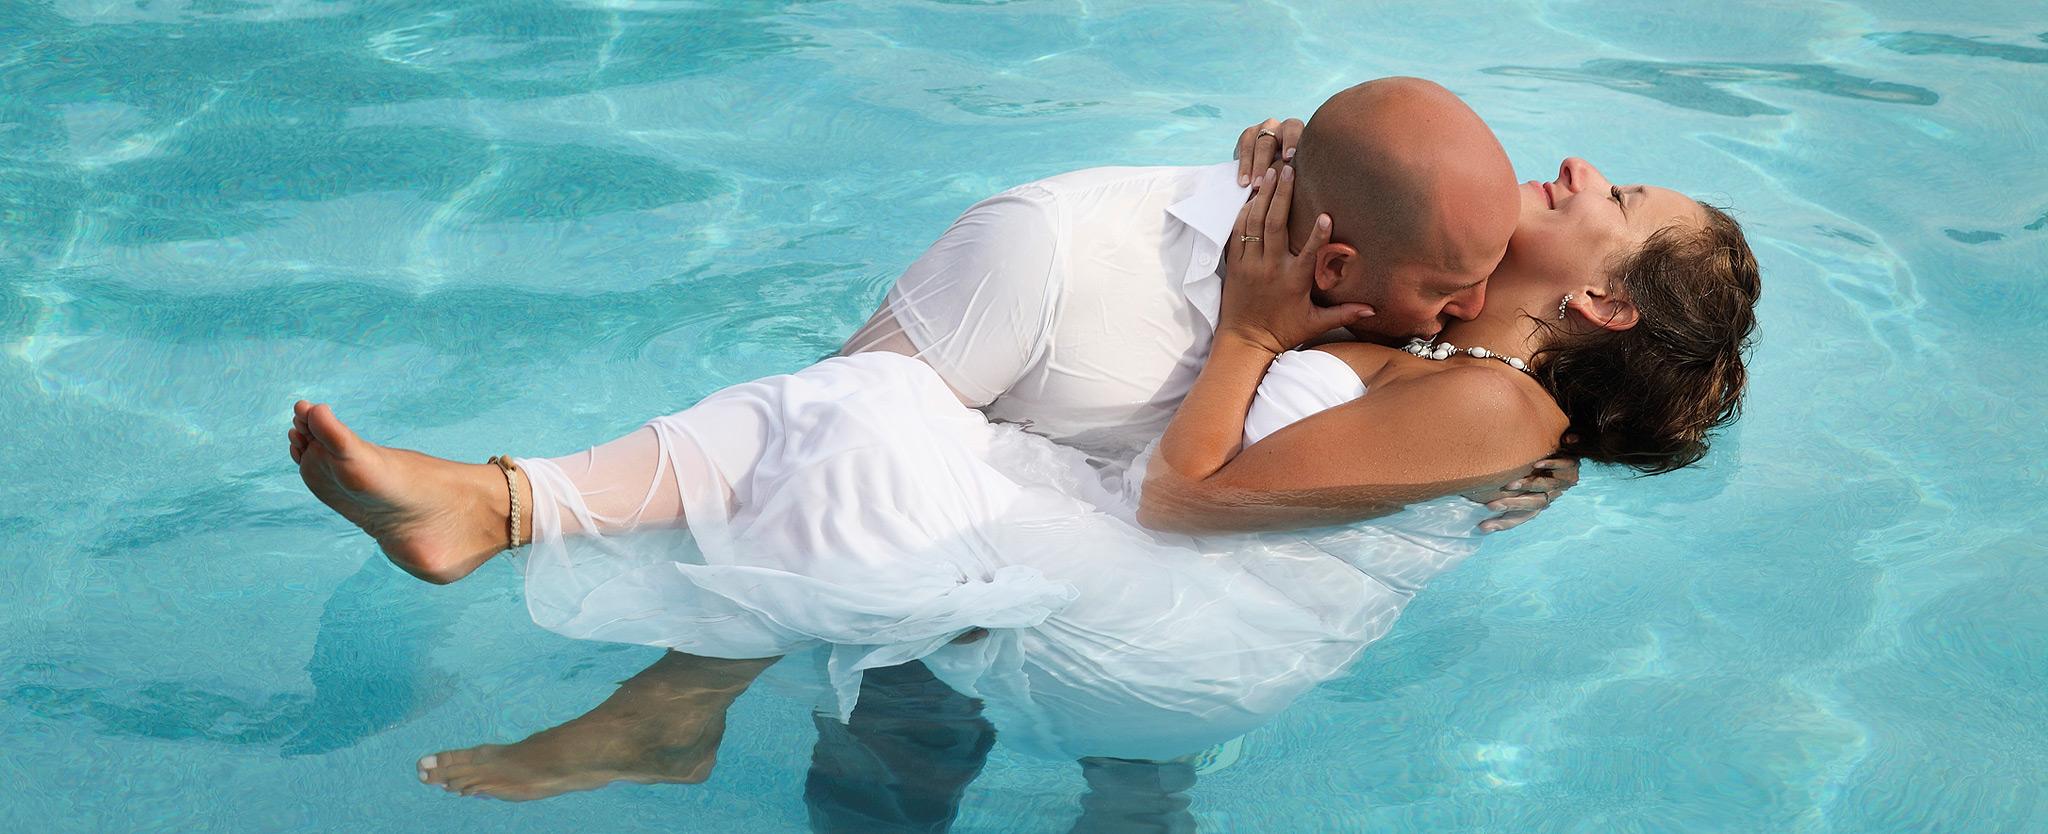 photographe-mariage-trash-the-dress-piscine-rigaud-stephane-lariviere-photo-photographie